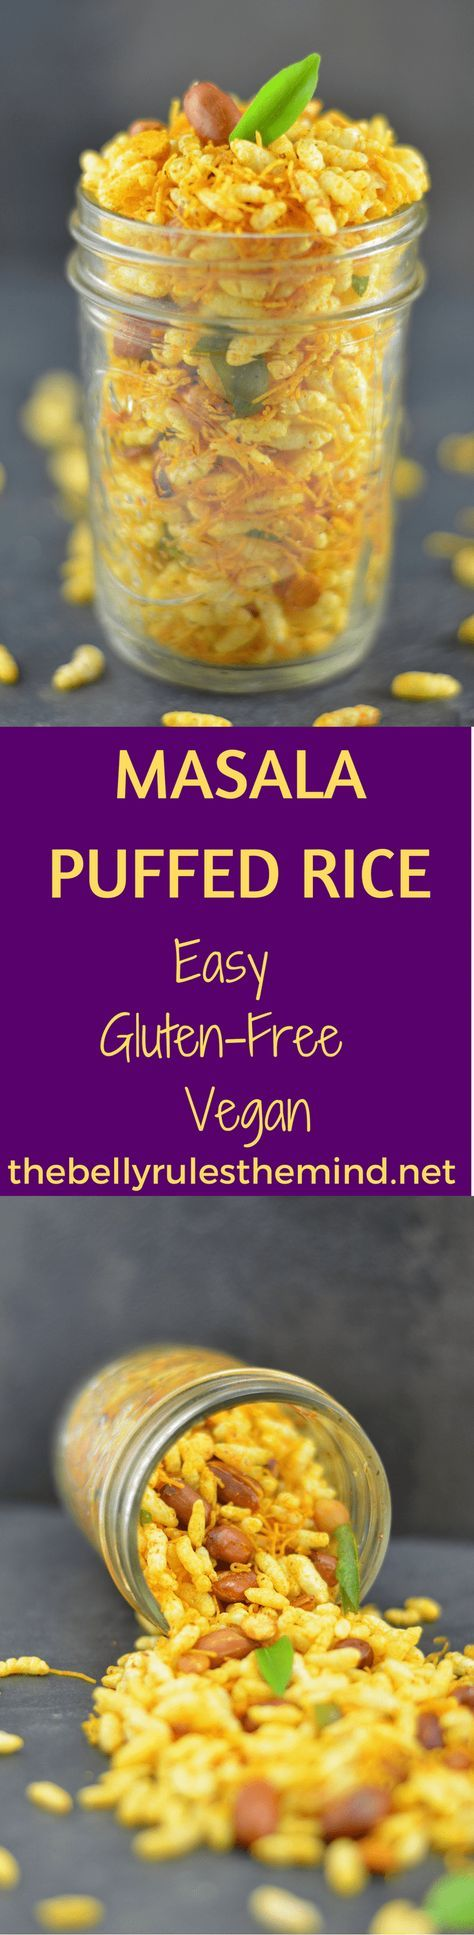 Masala Puffed Rice | Recipe | Appetizer recipes, Indian ...